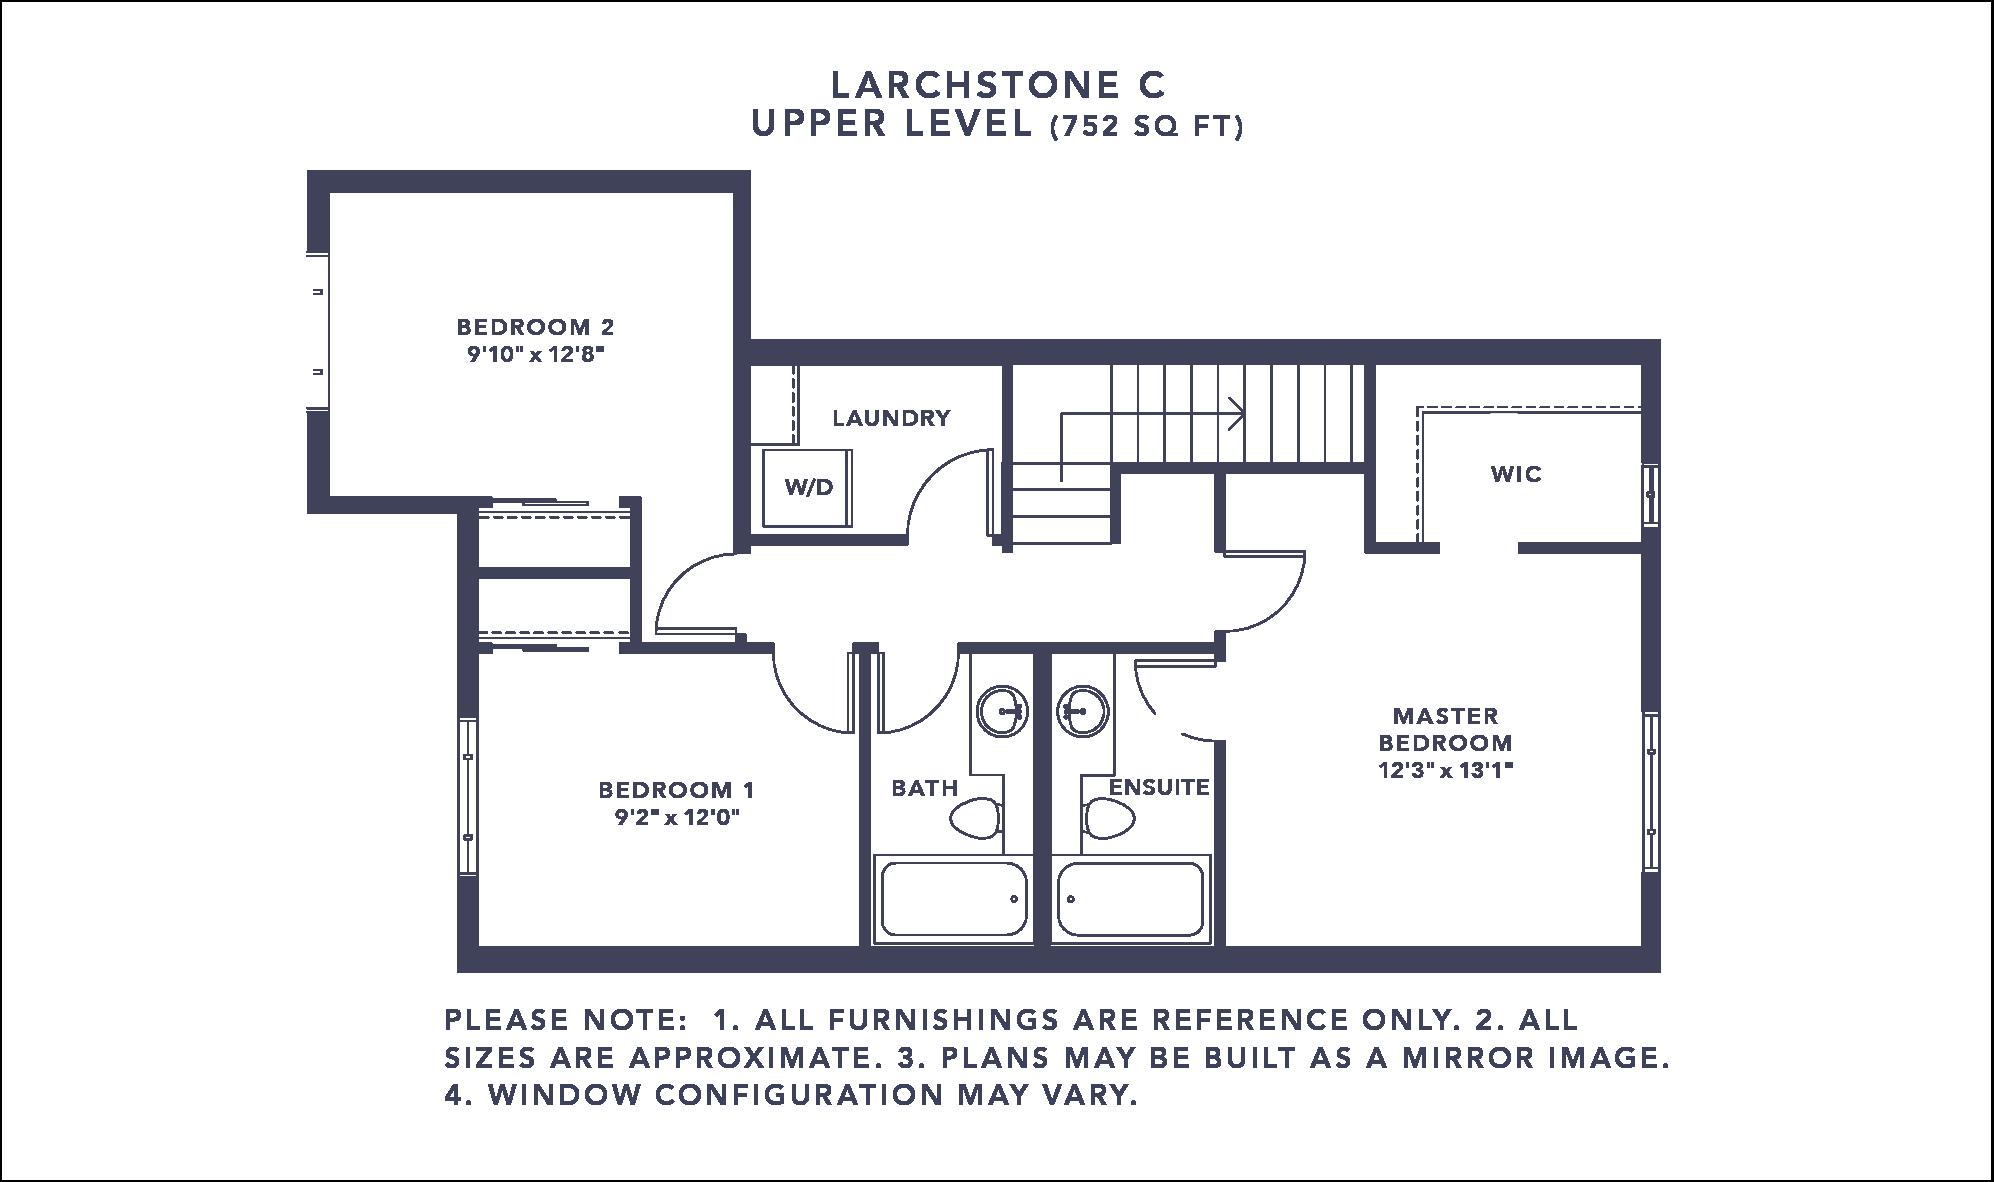 Larchstone C Floorplan - Upper Level